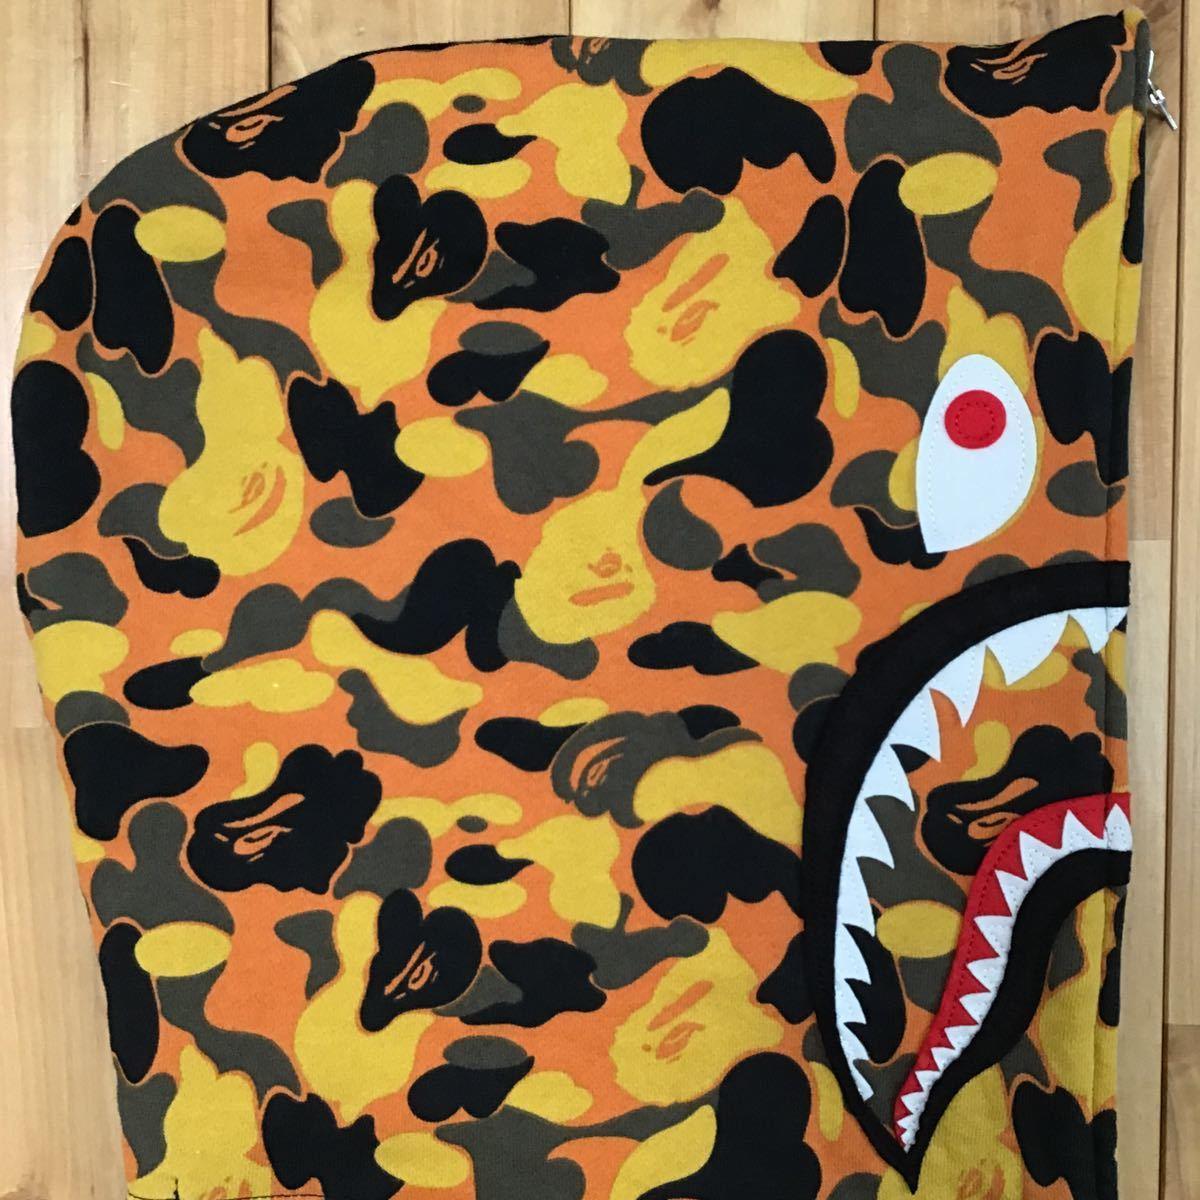 ★2XL★ XO × BAPE シャーク パーカー a bathing ape The Weeknd shark full zip hoodie エイプ ベイプ orange camo 迷彩 XXL